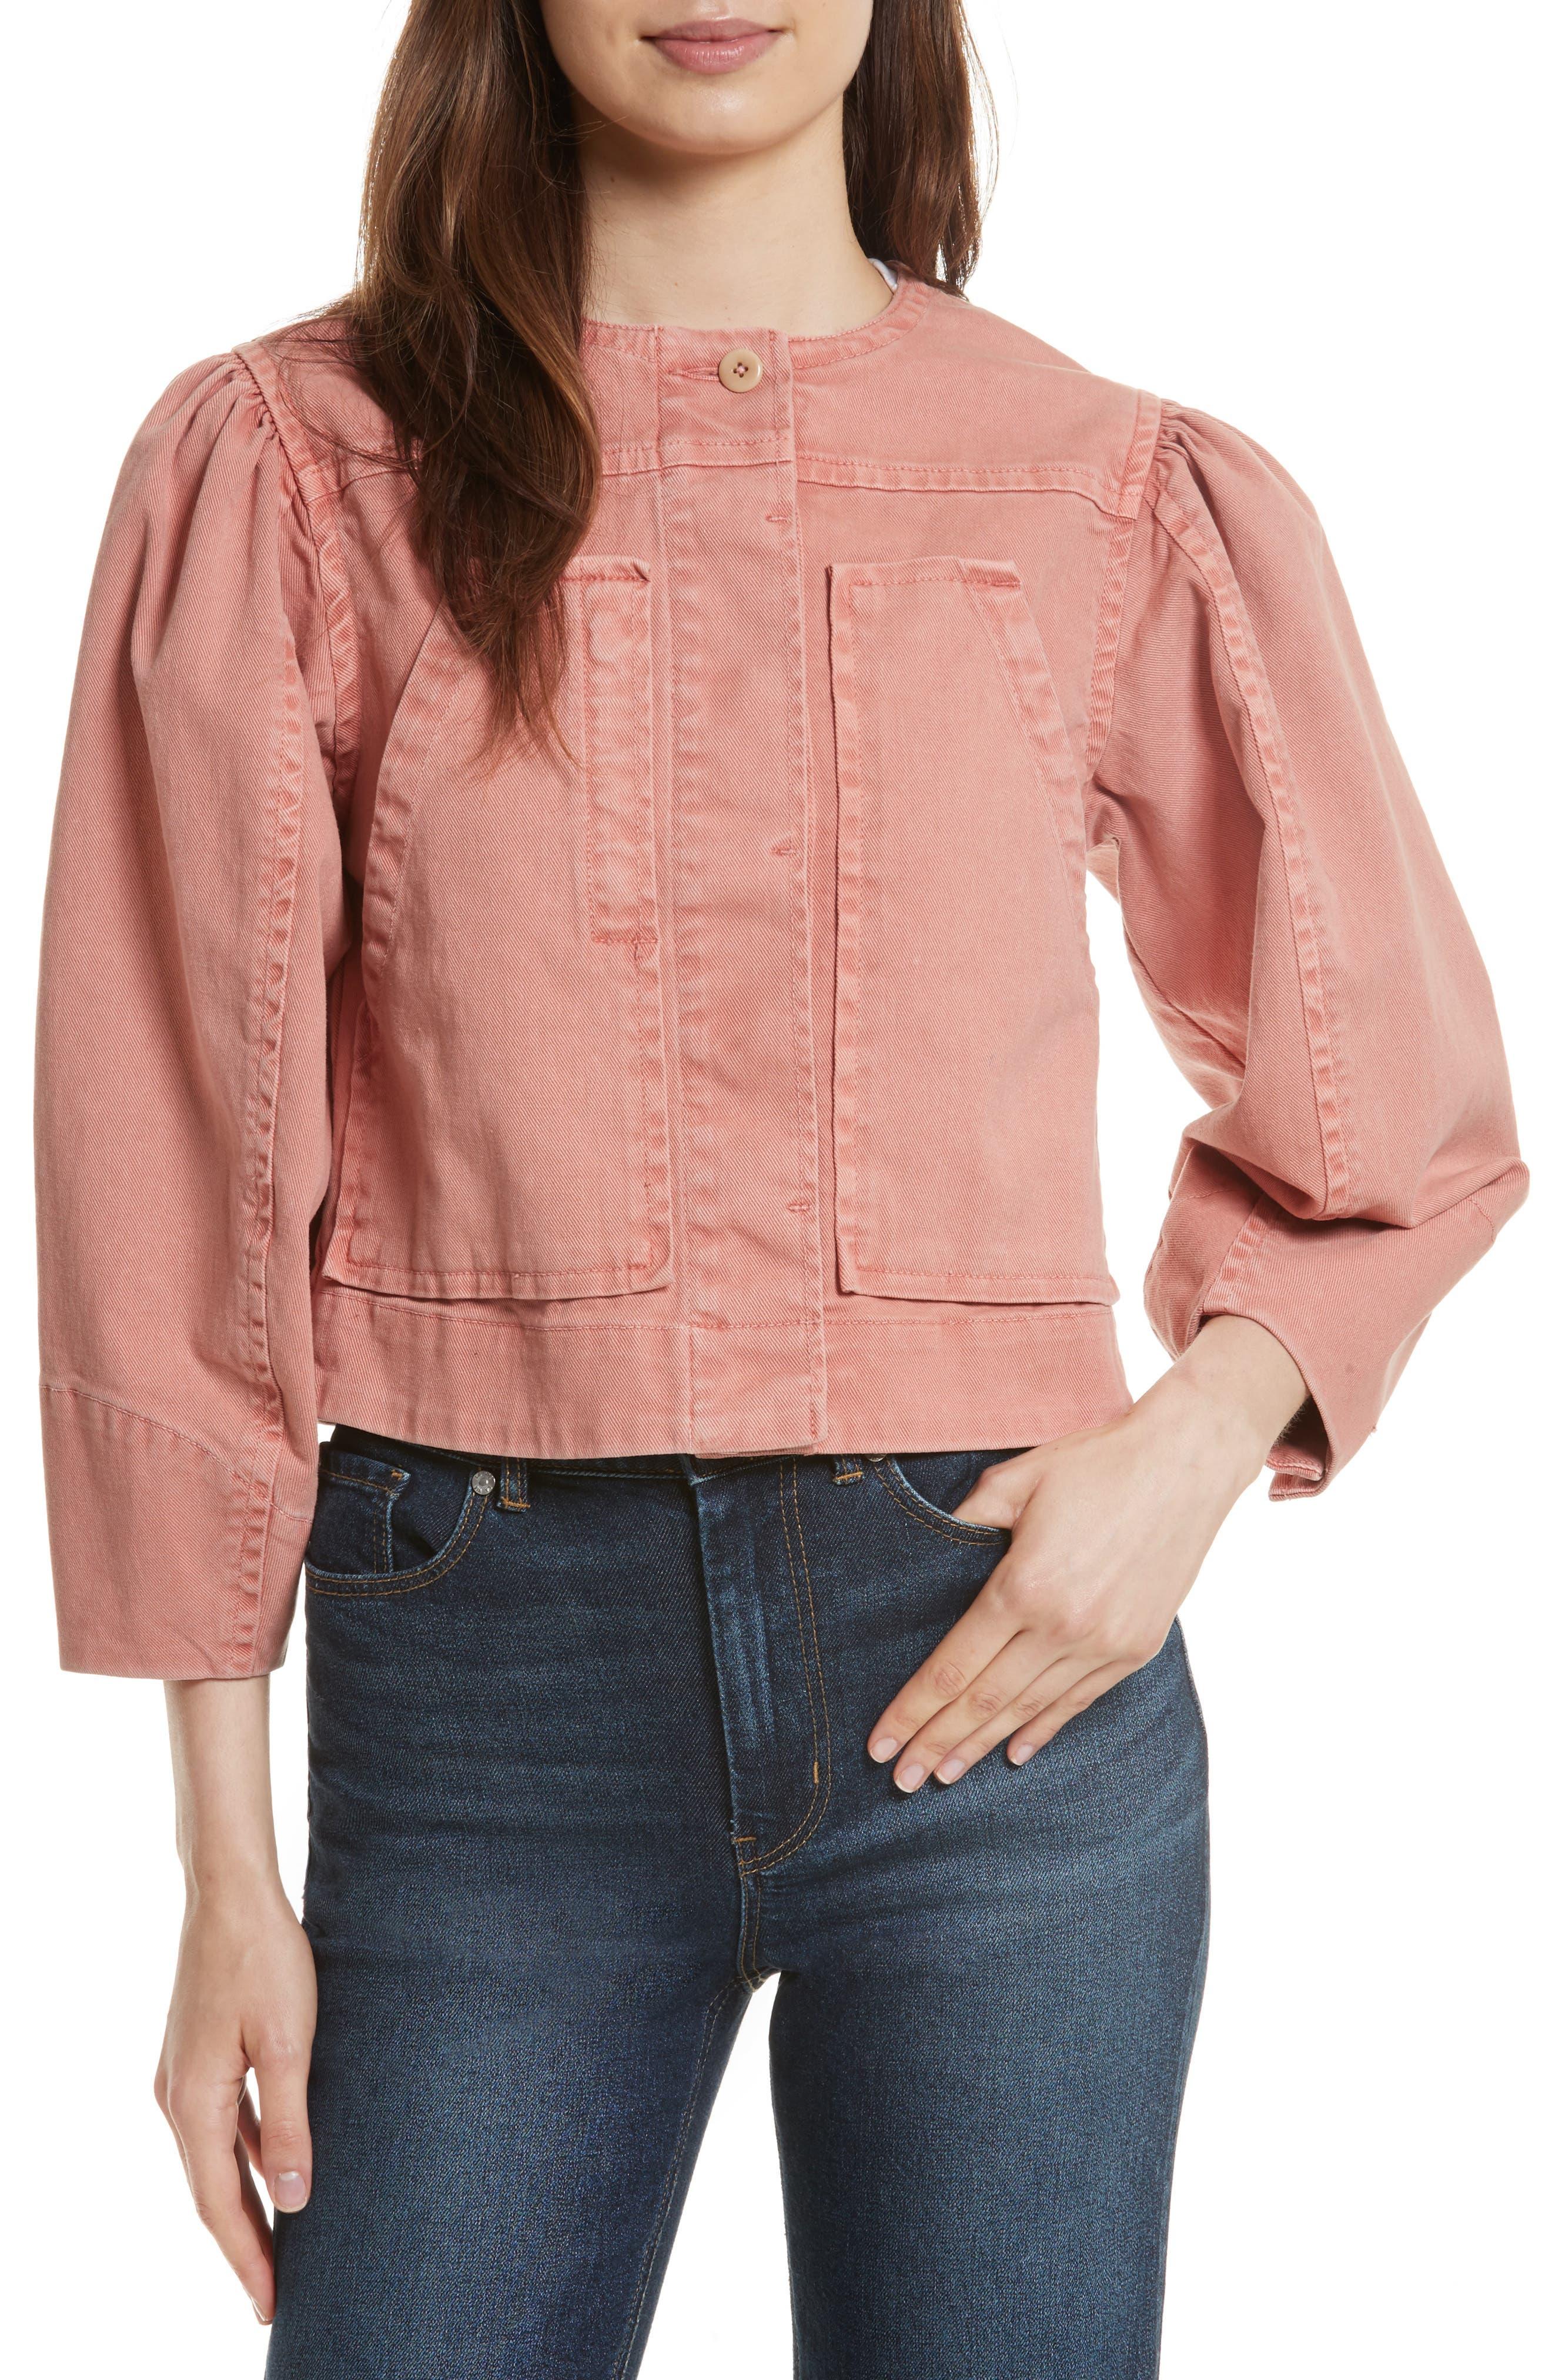 Main Image - La Vie Rebecca Taylor Garment Dyed Twill Jacket